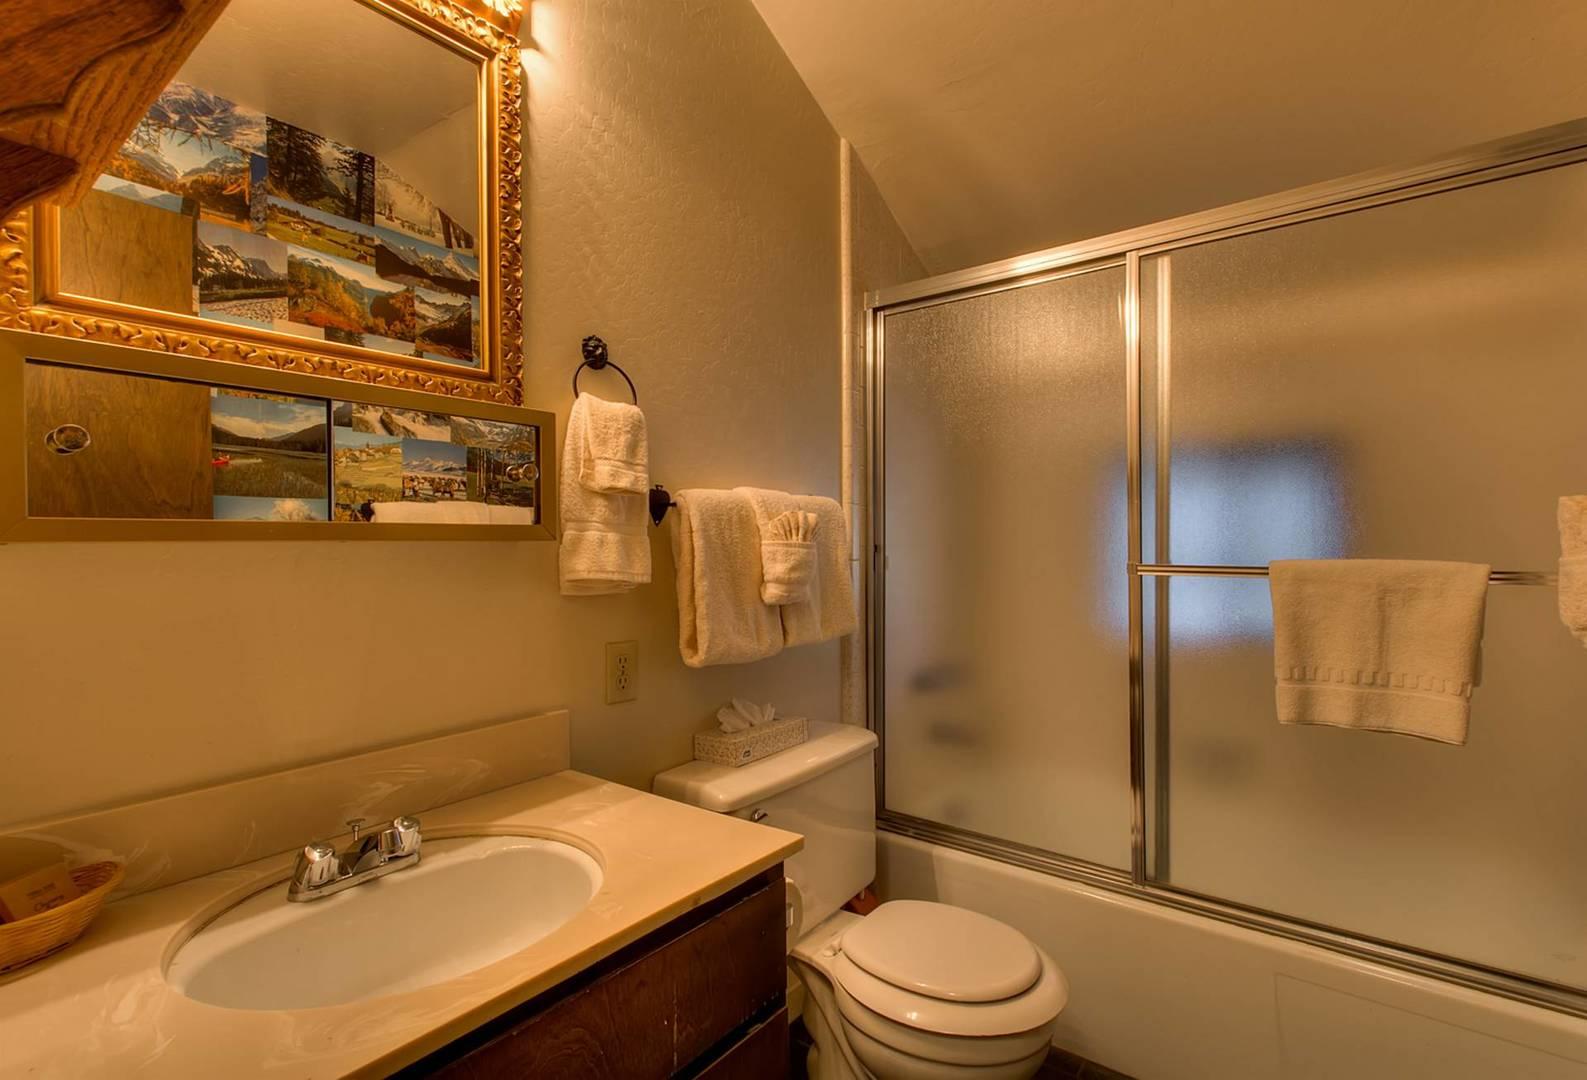 ivh1051 bathroom